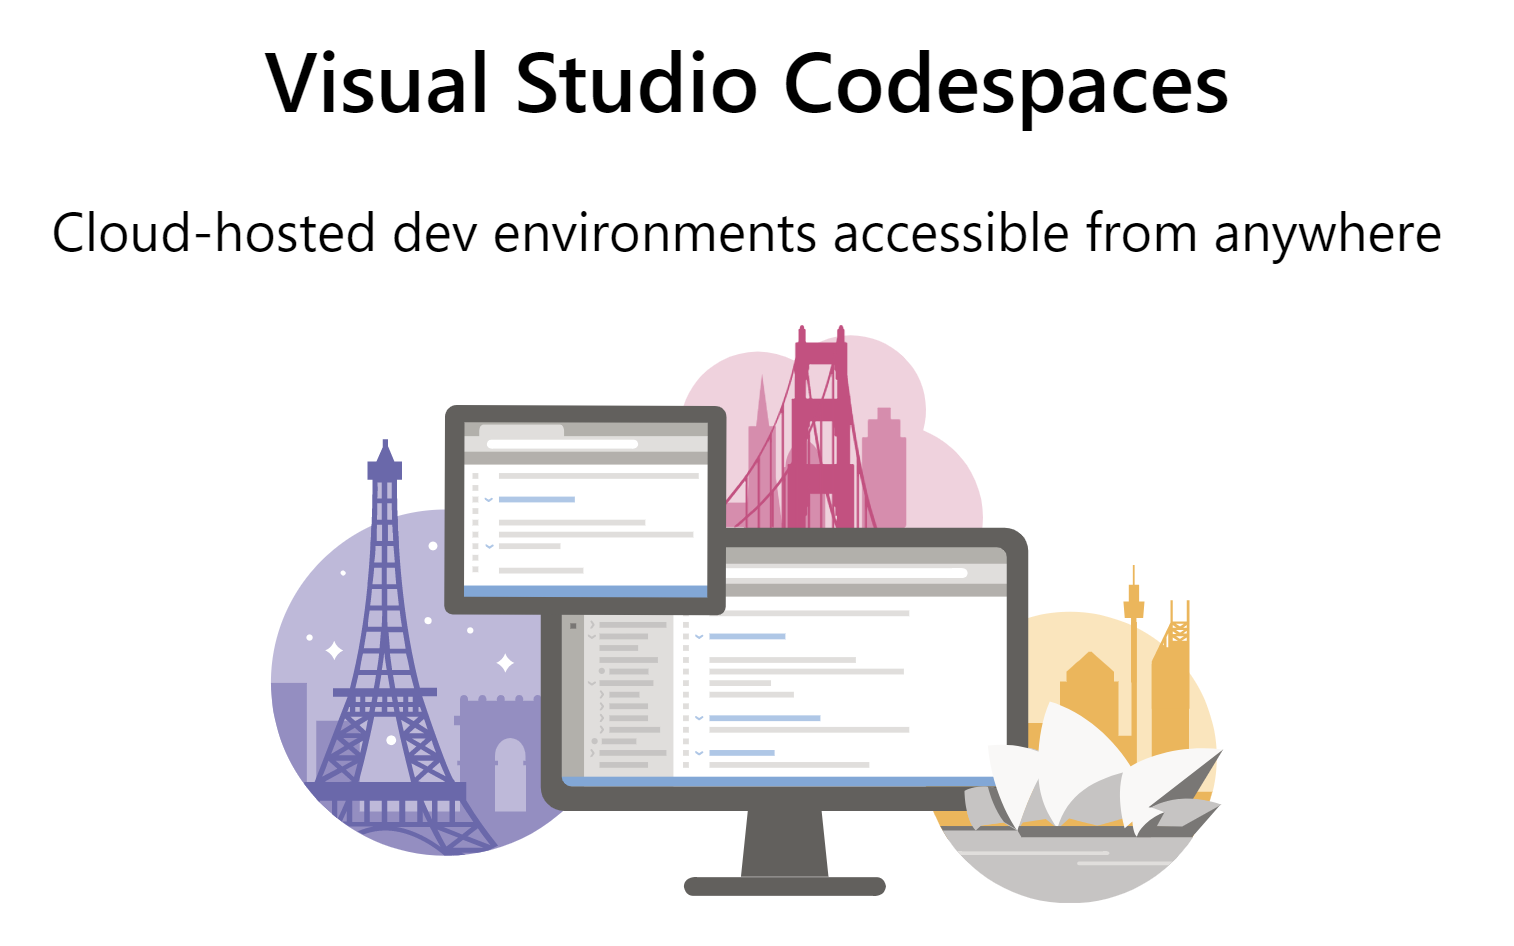 Visual Studio Codespaces